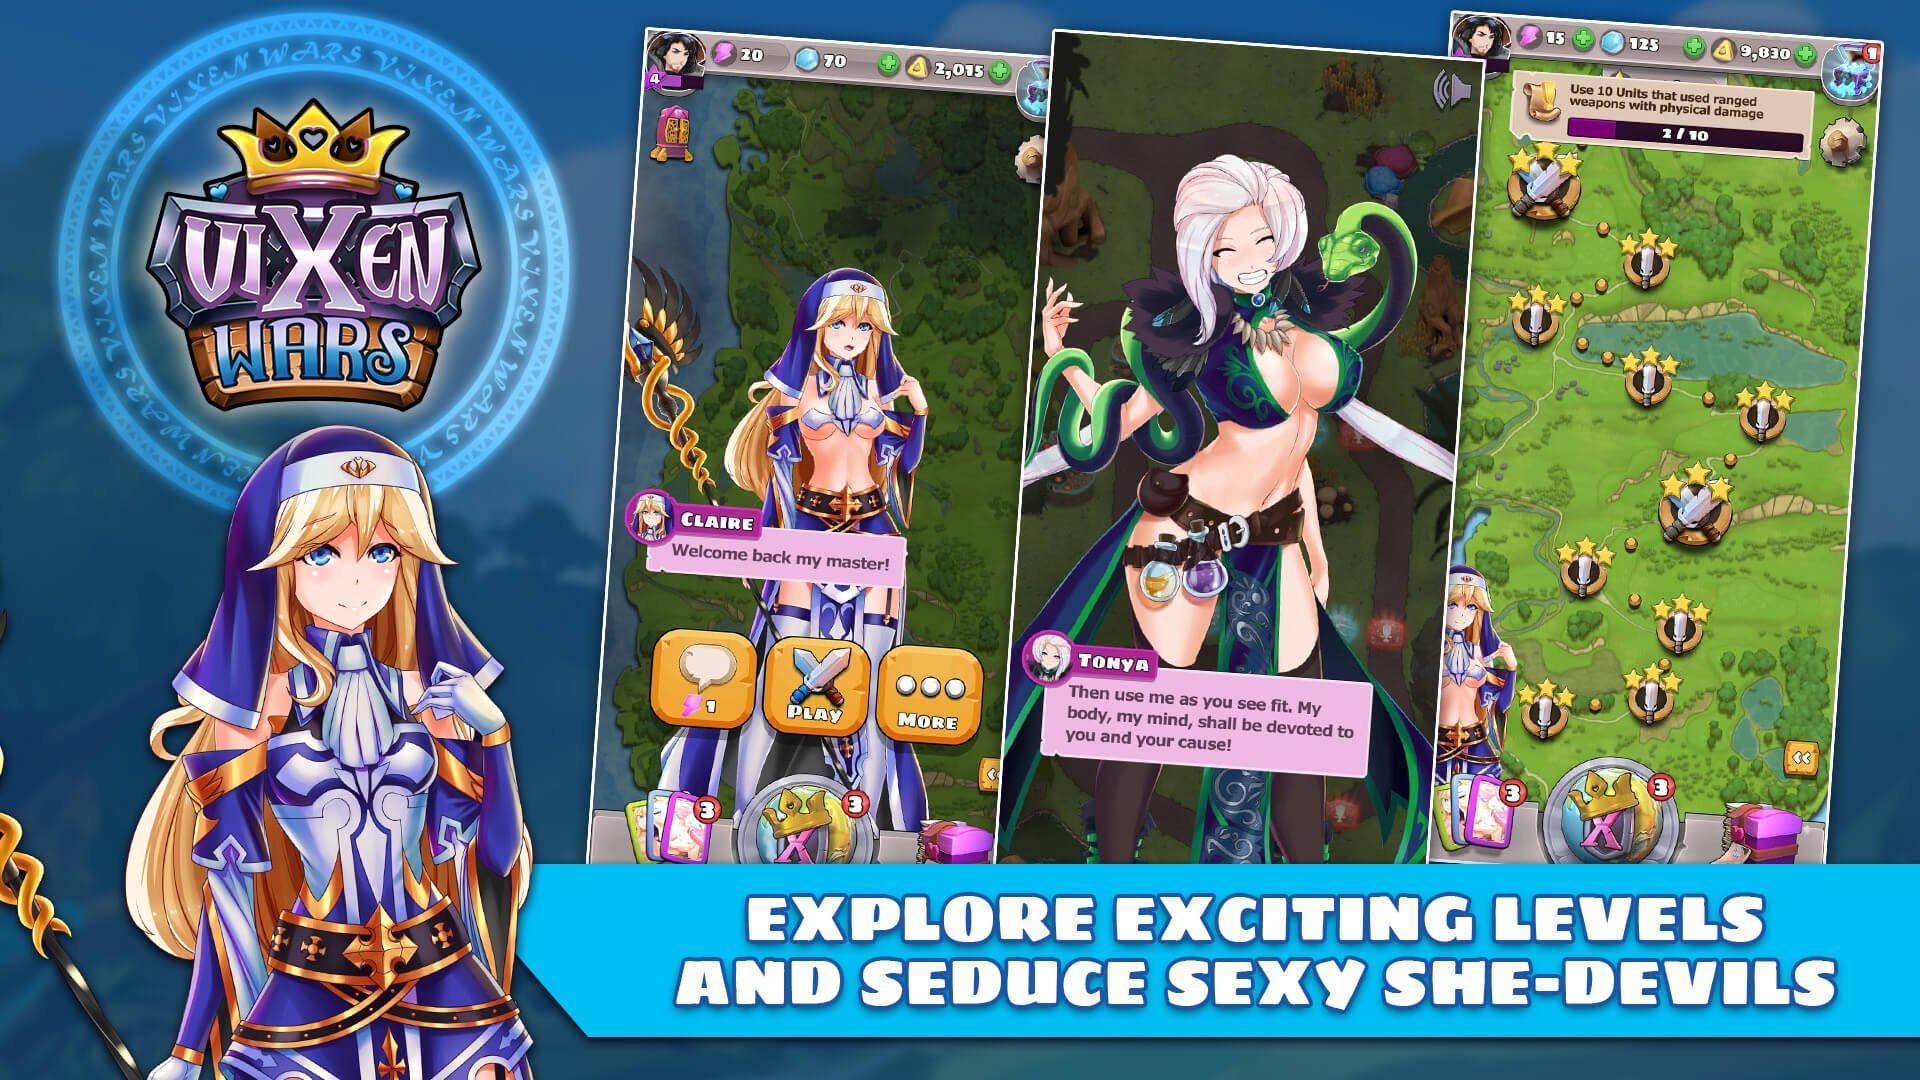 action-adventure 遊戲 - Vixen Wars Game